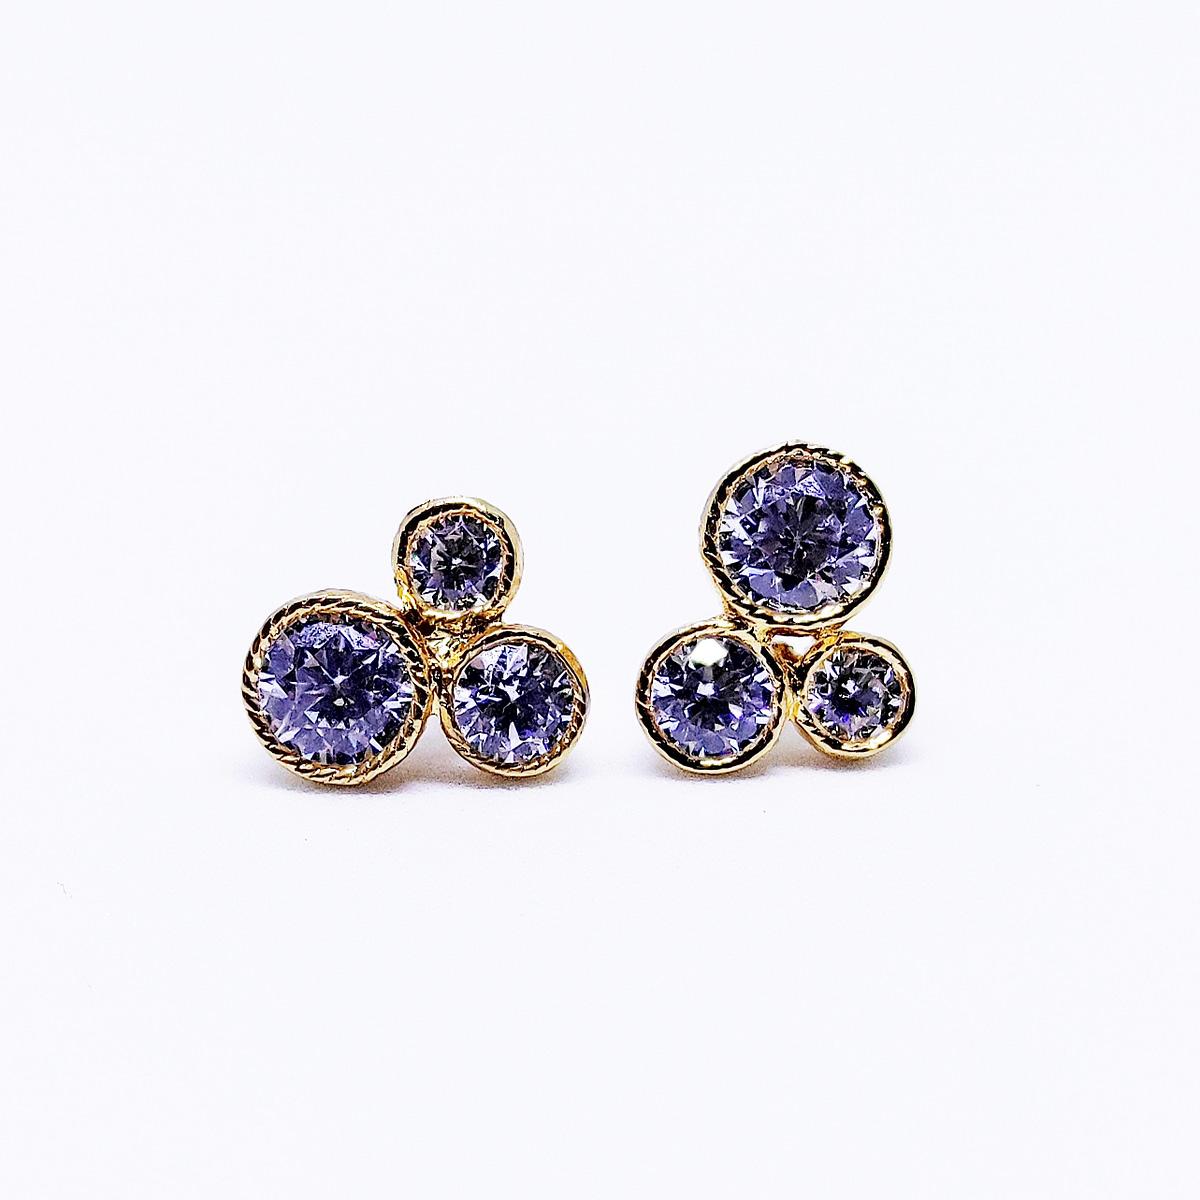 DISNEY - Earrings With Cubic Zirconia - Yellow